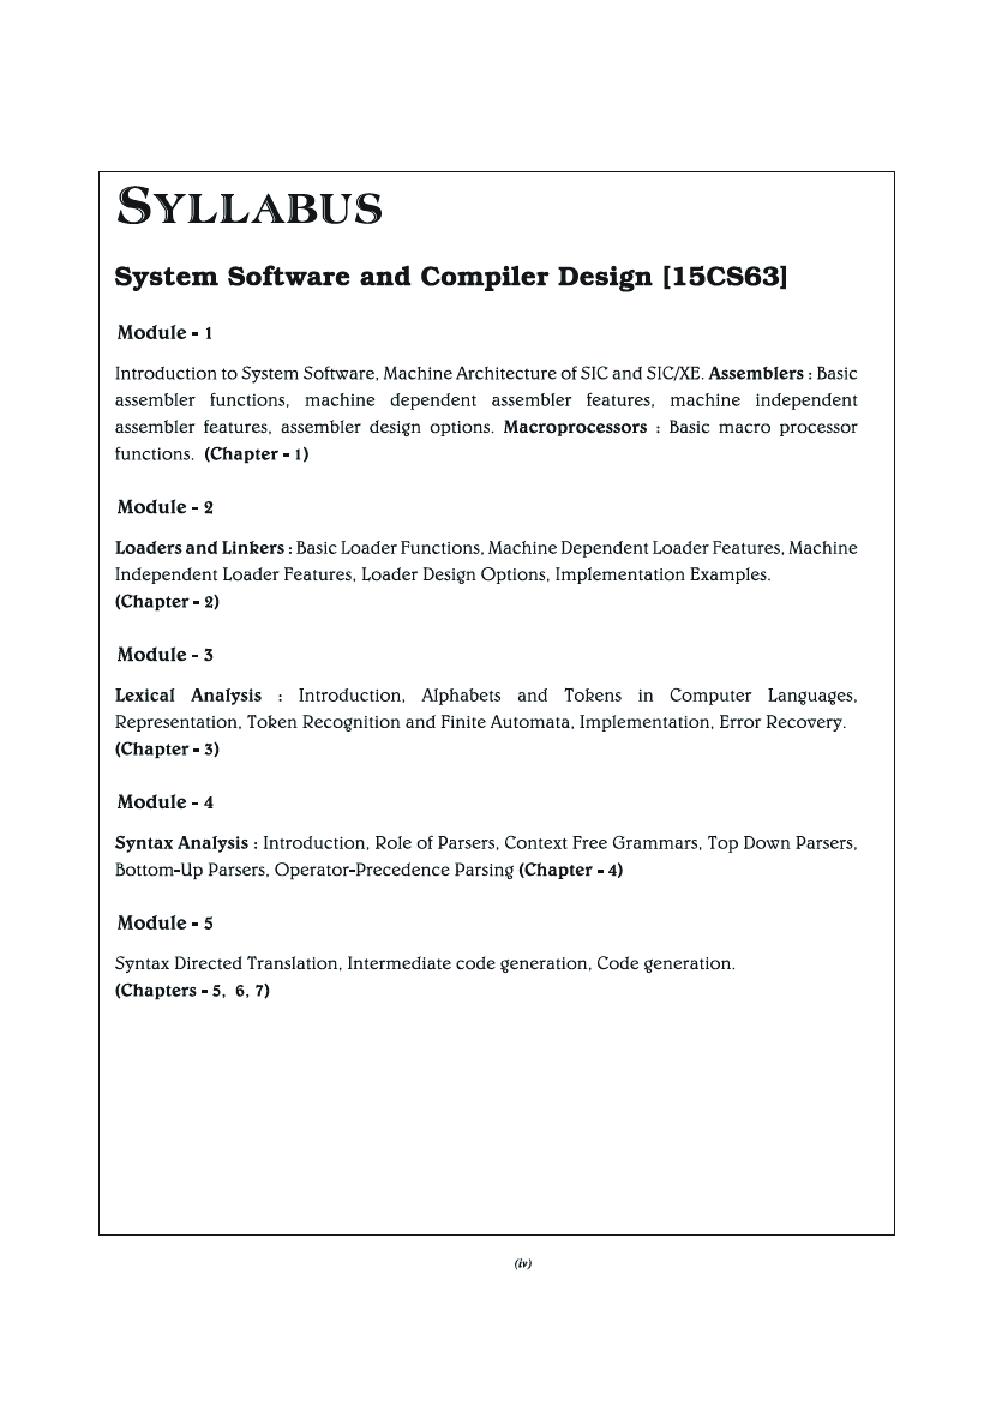 Download System Software Compiler Design For Vtu Course 15 Cbcs Vi Cse 15cs63 By A A Puntambekar I A Dhotre Pdf Online